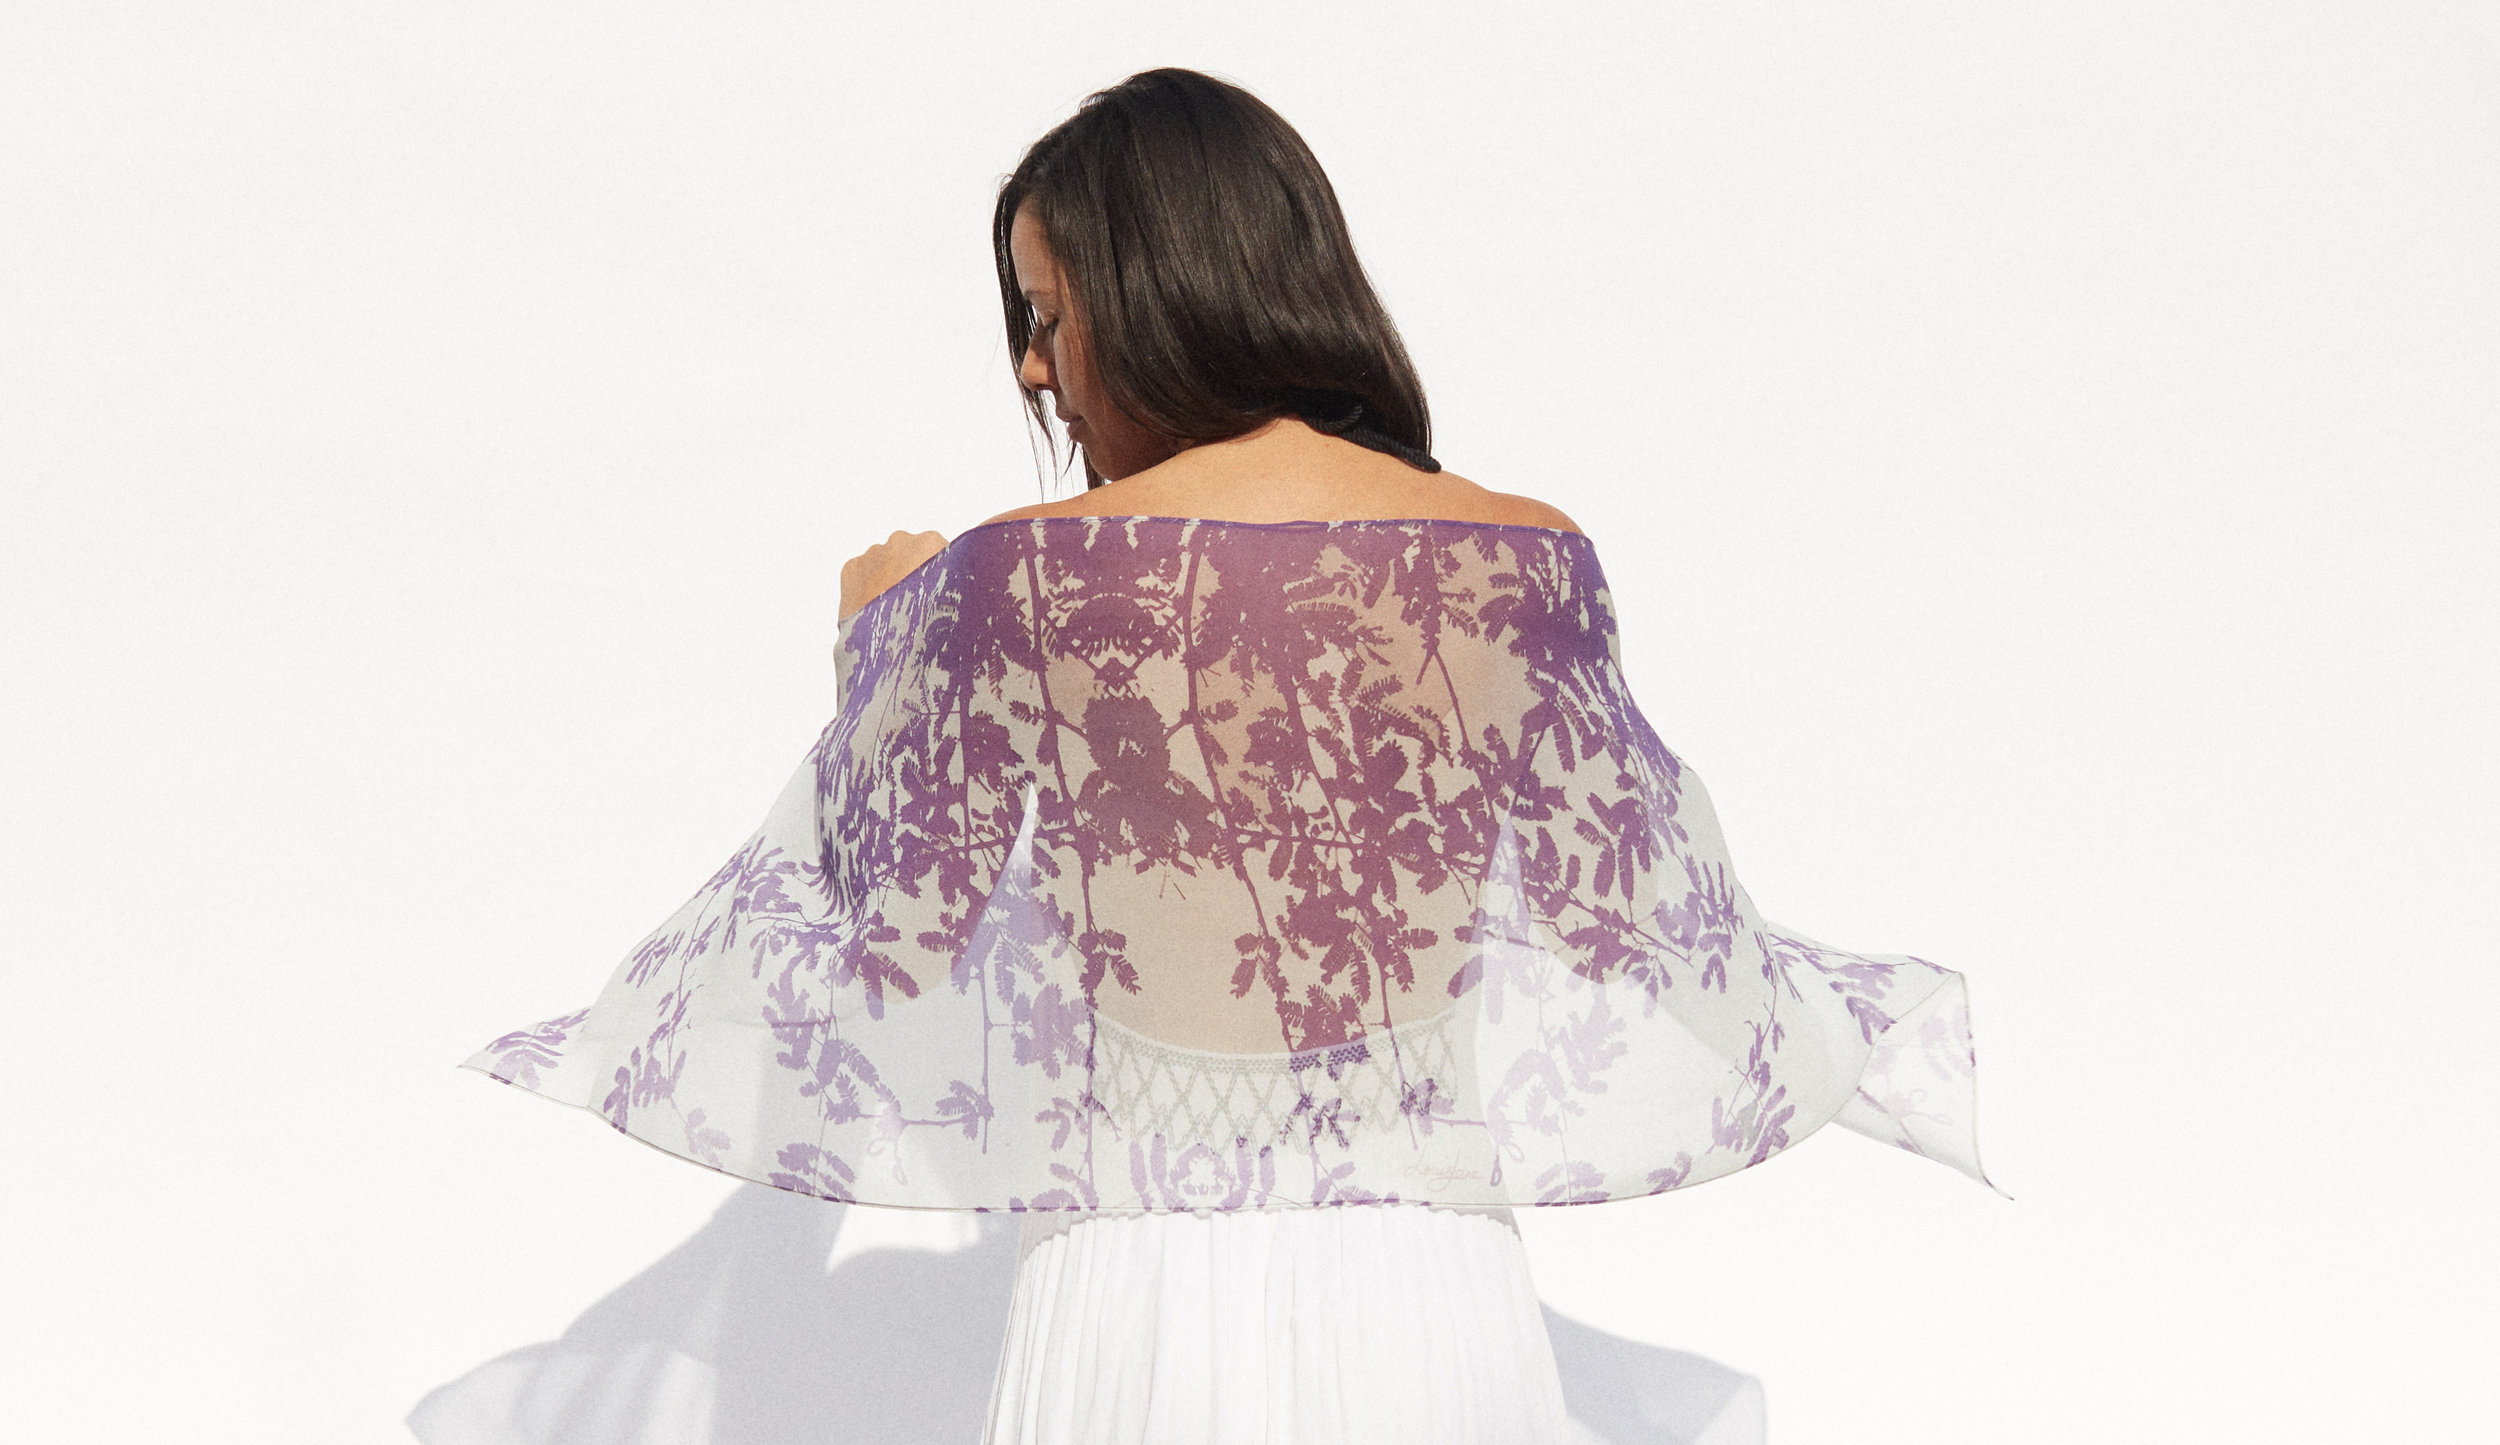 LouisJane_April_2018_fern sprays purple draped over back_cropped.jpg